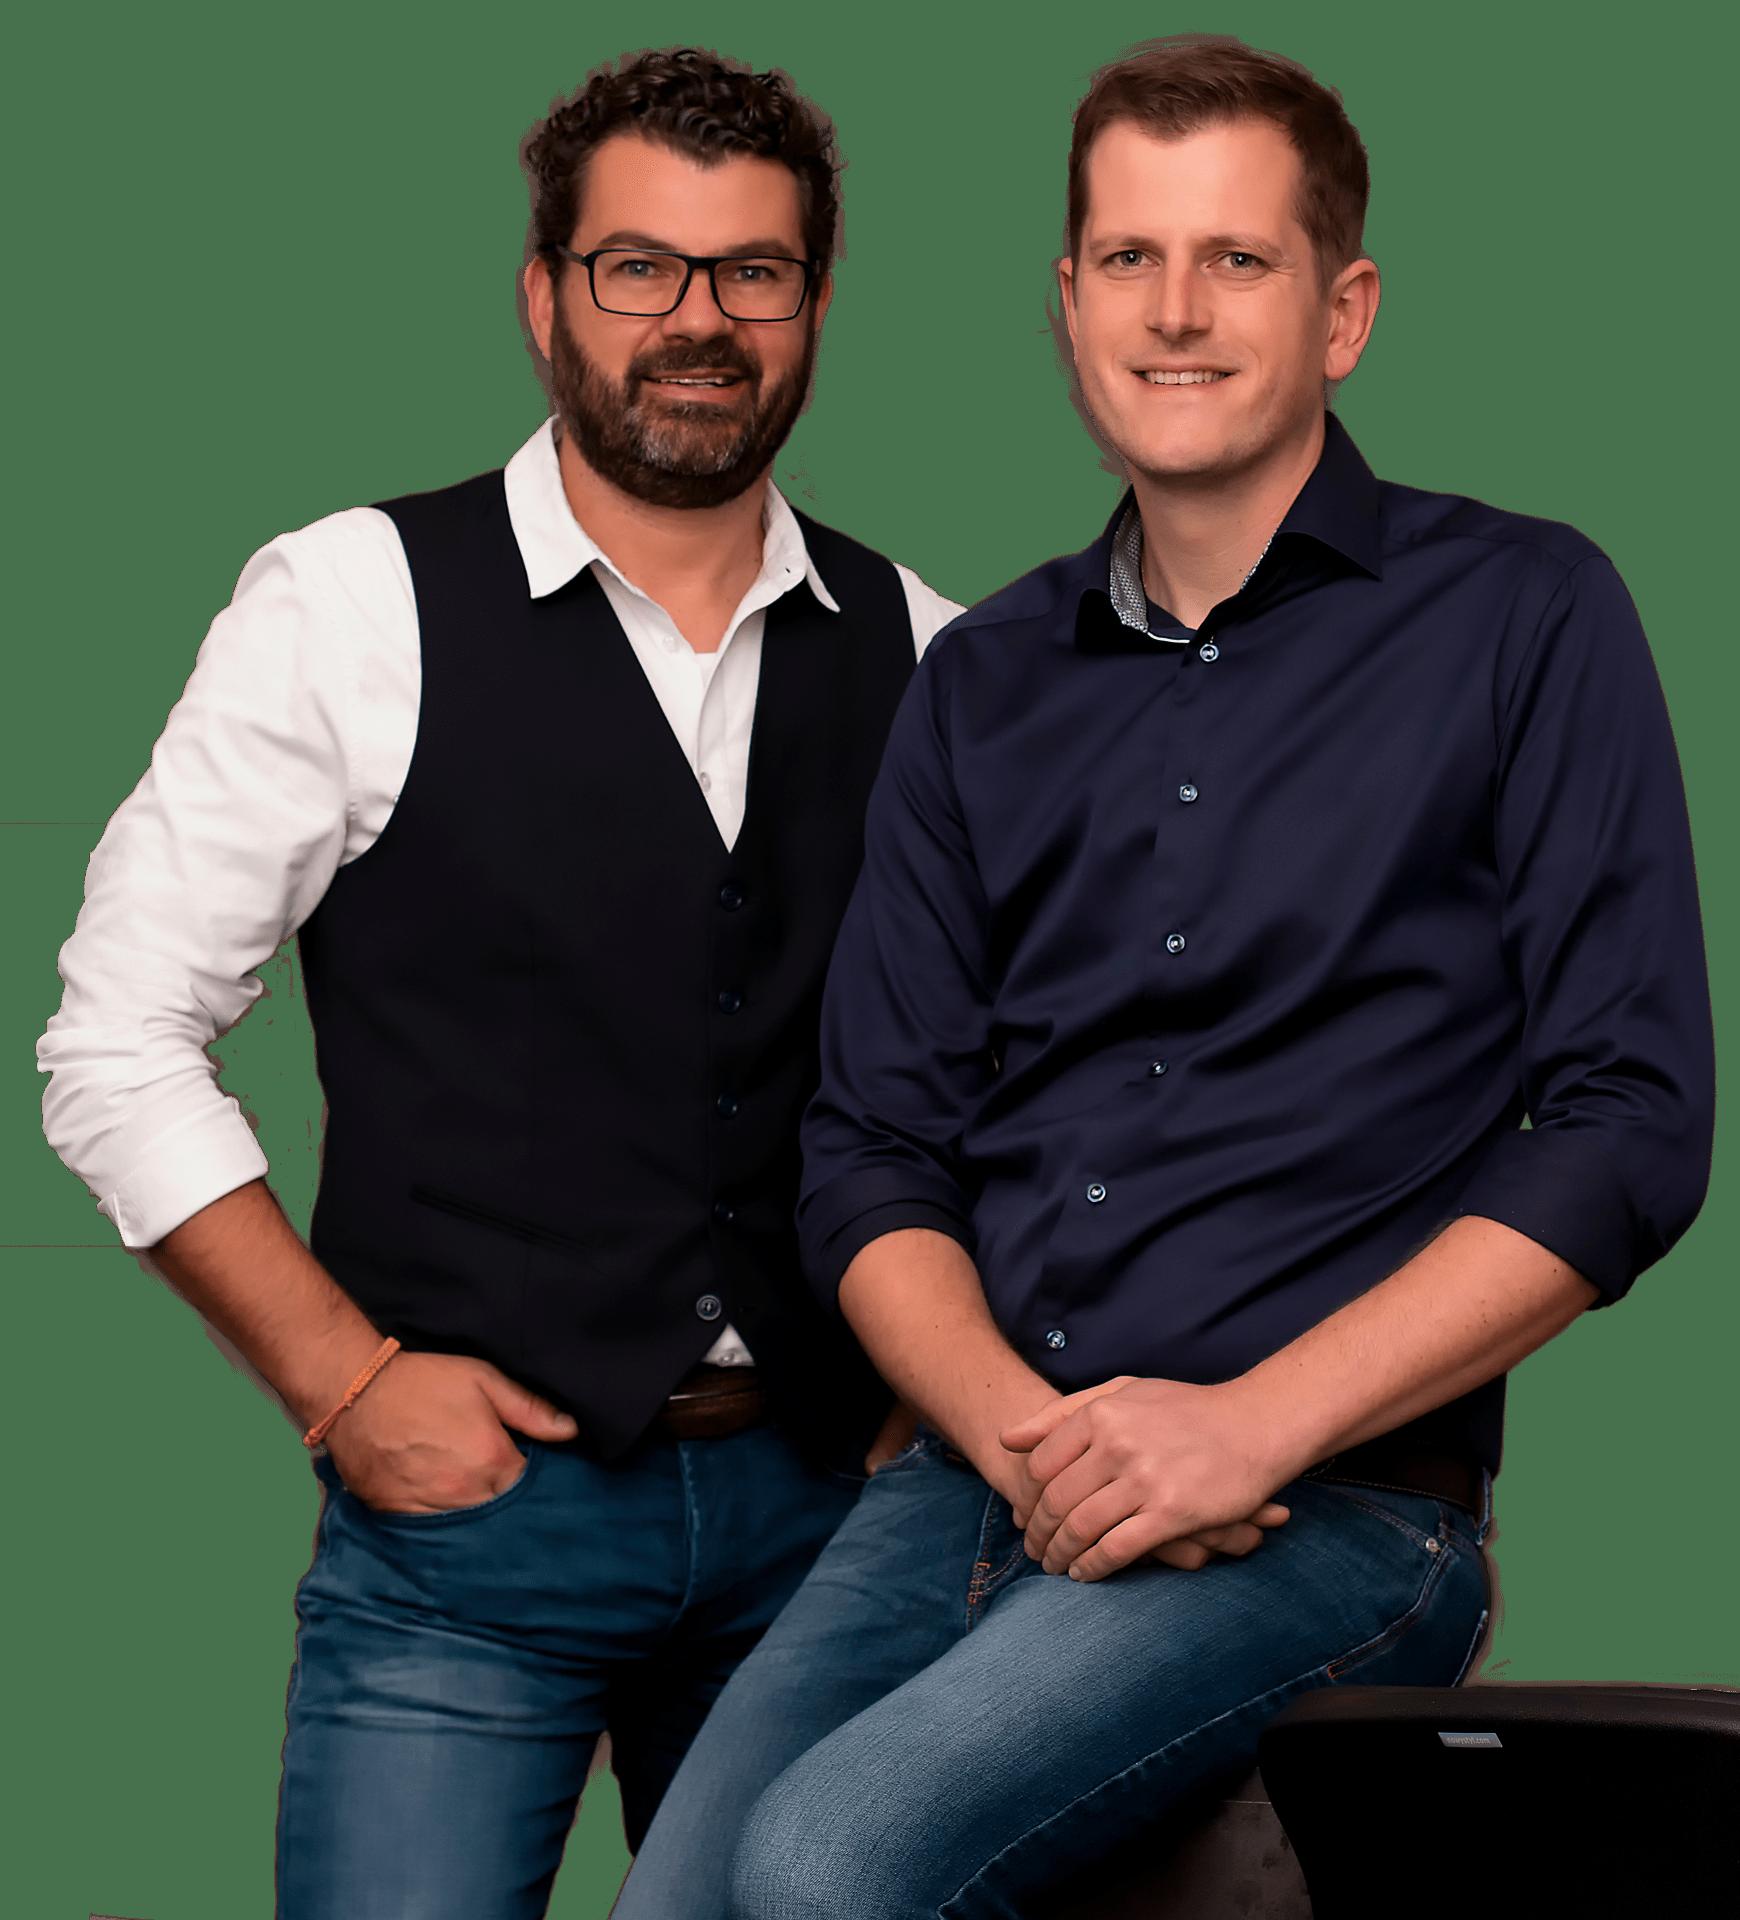 Mario und Johannes Rumpfinger